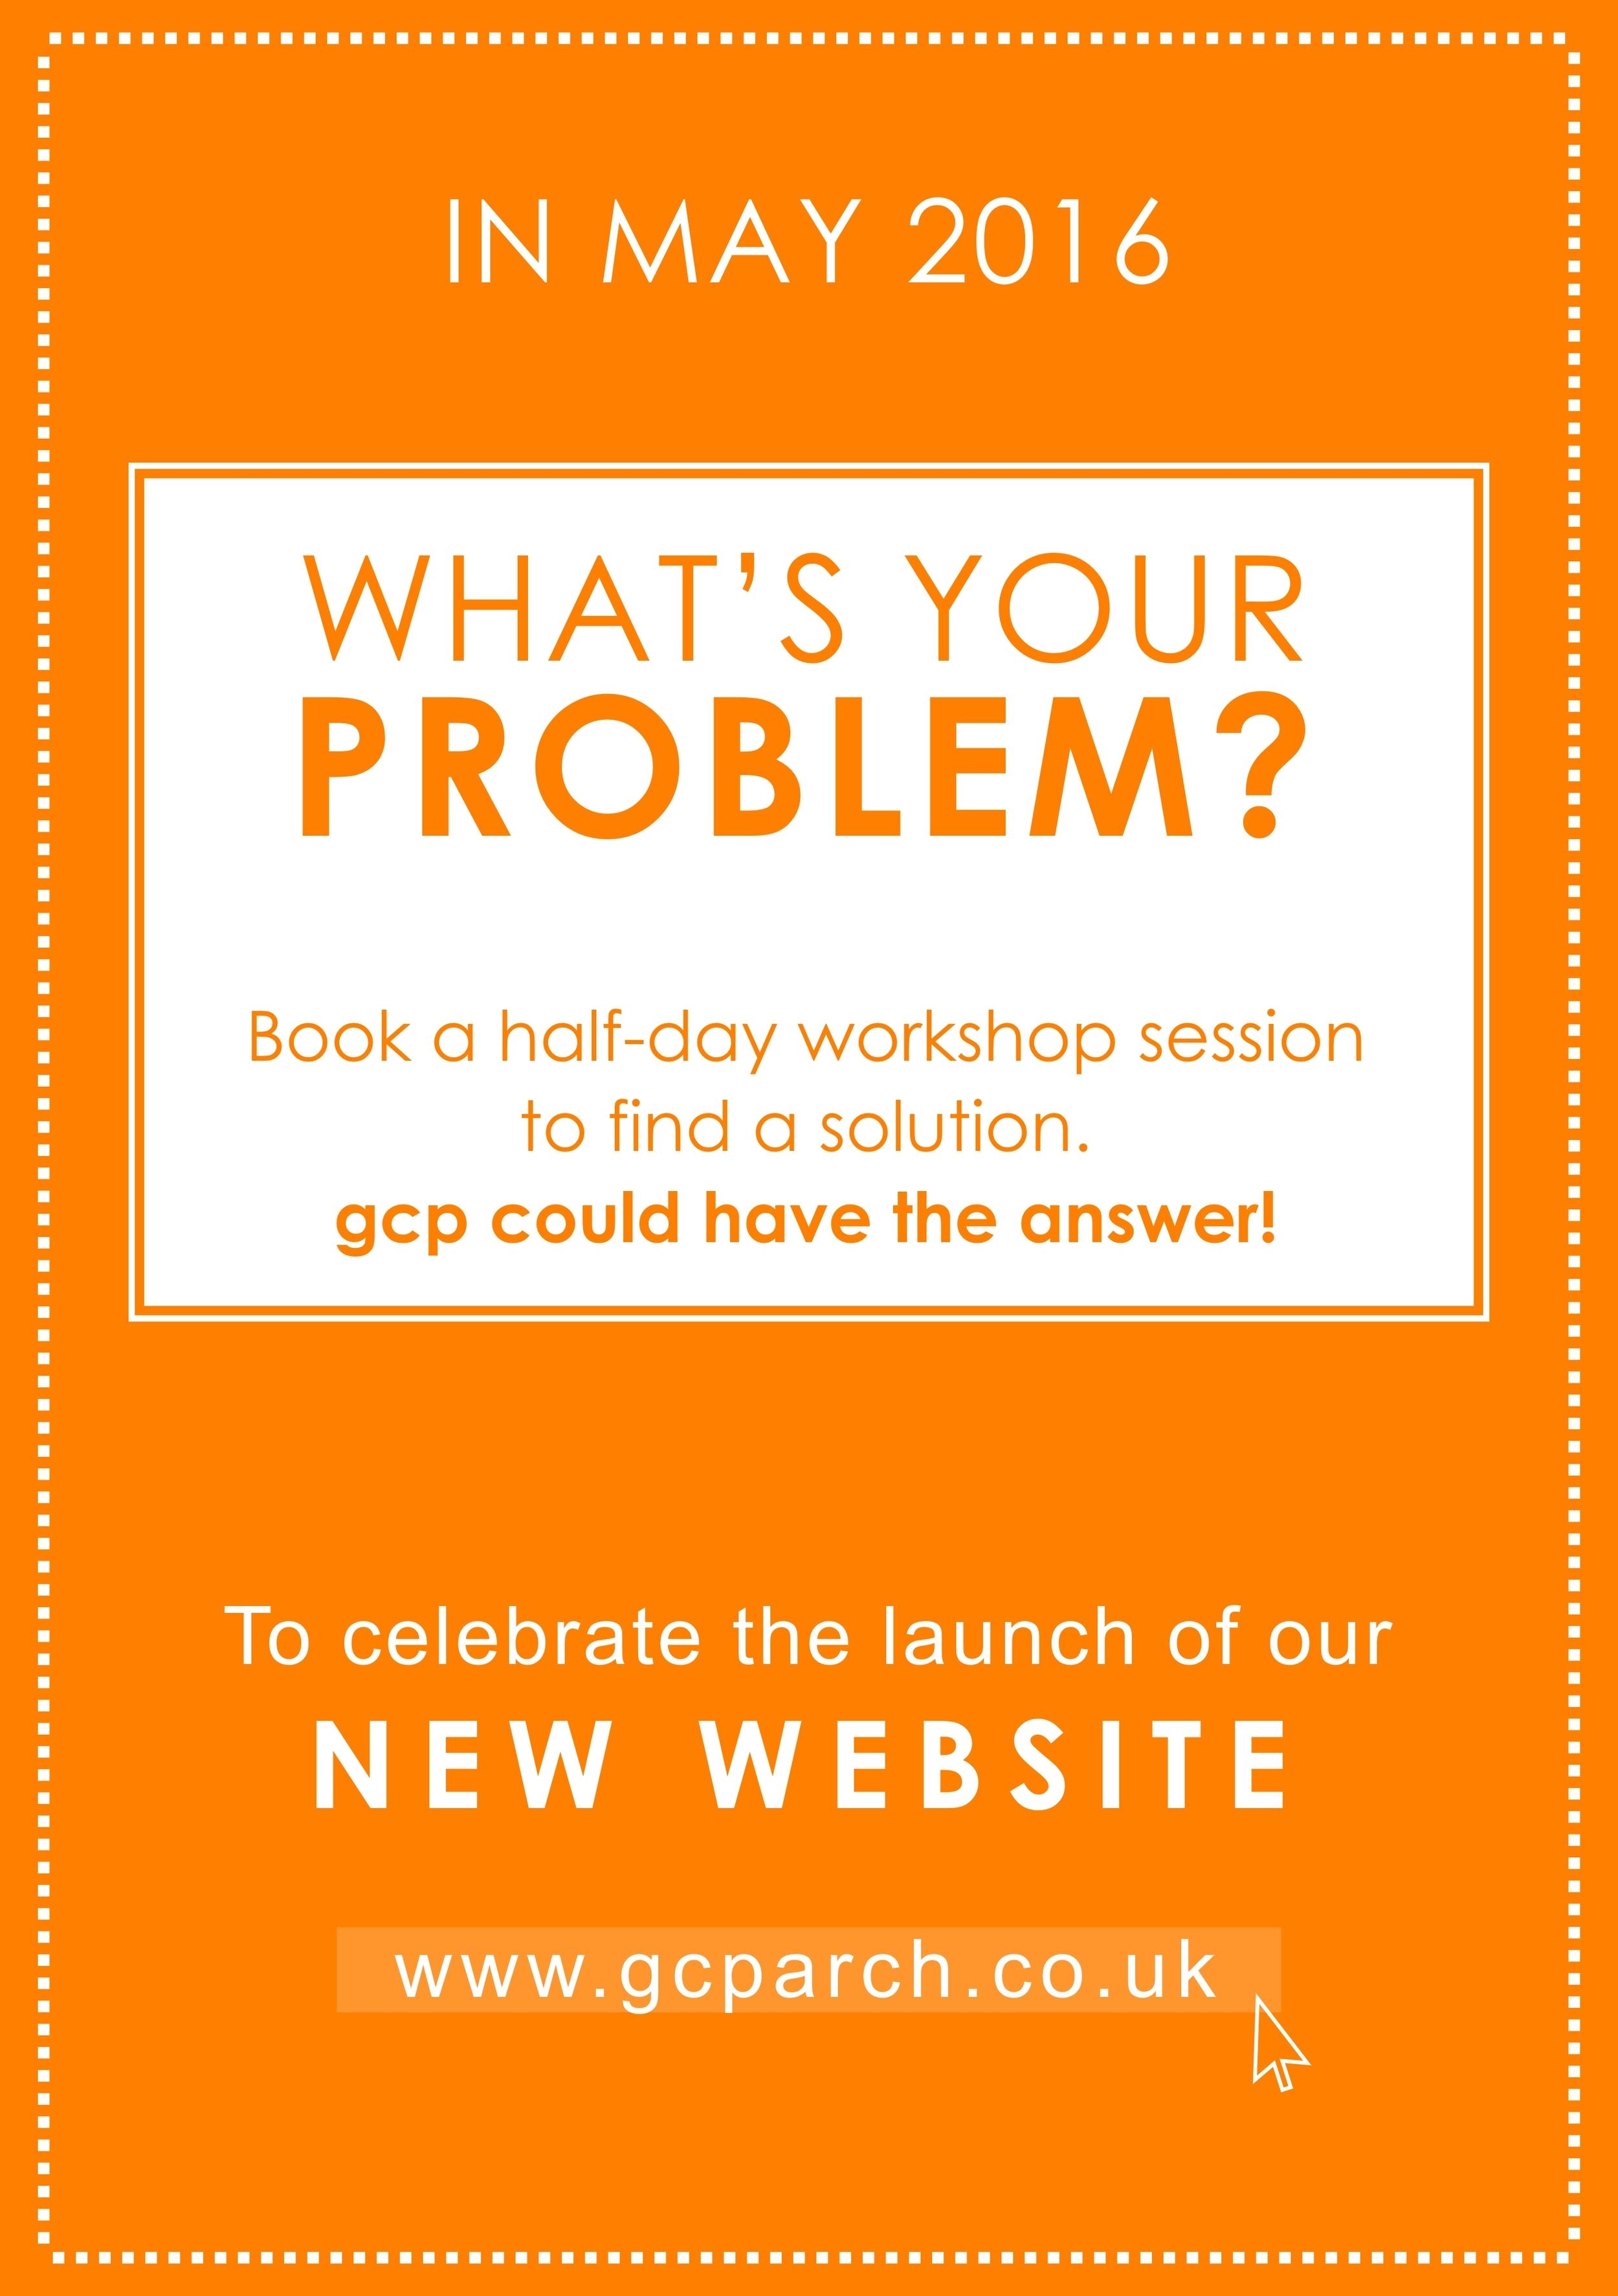 gcp new website launch